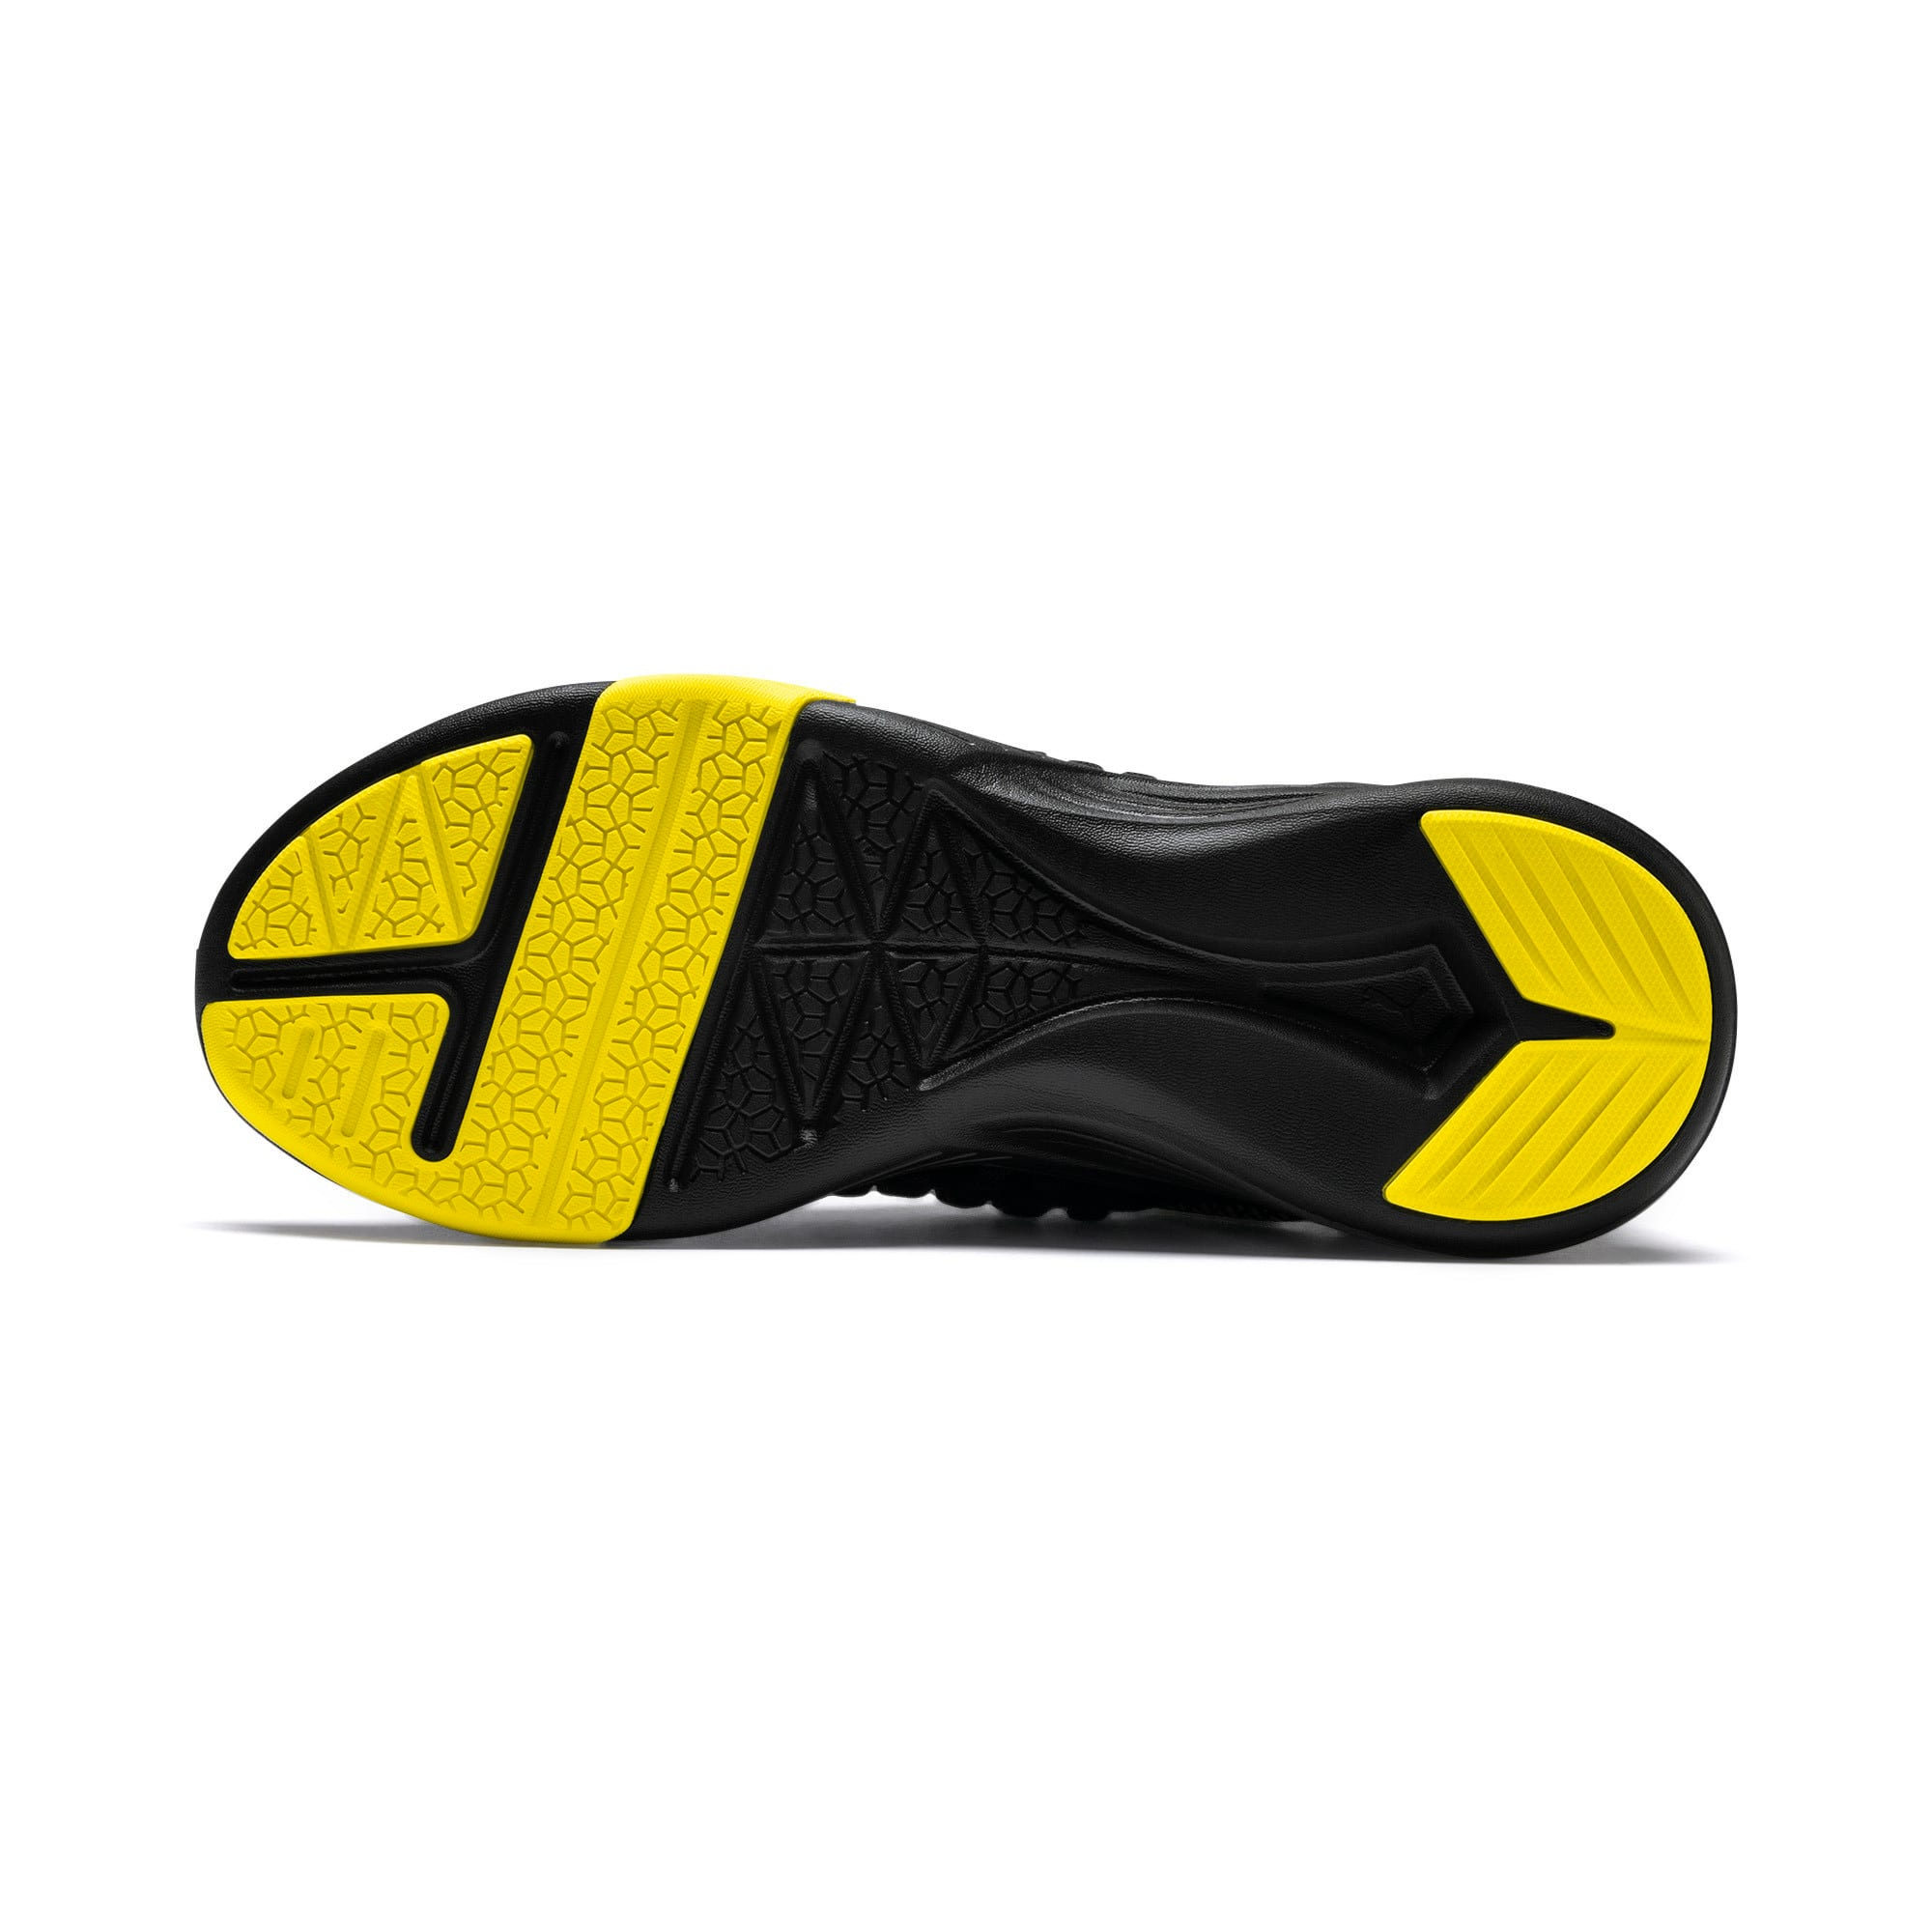 Thumbnail 4 of Mantra Caution Men's Training Shoes, Puma Black-Blazing Yellow, medium